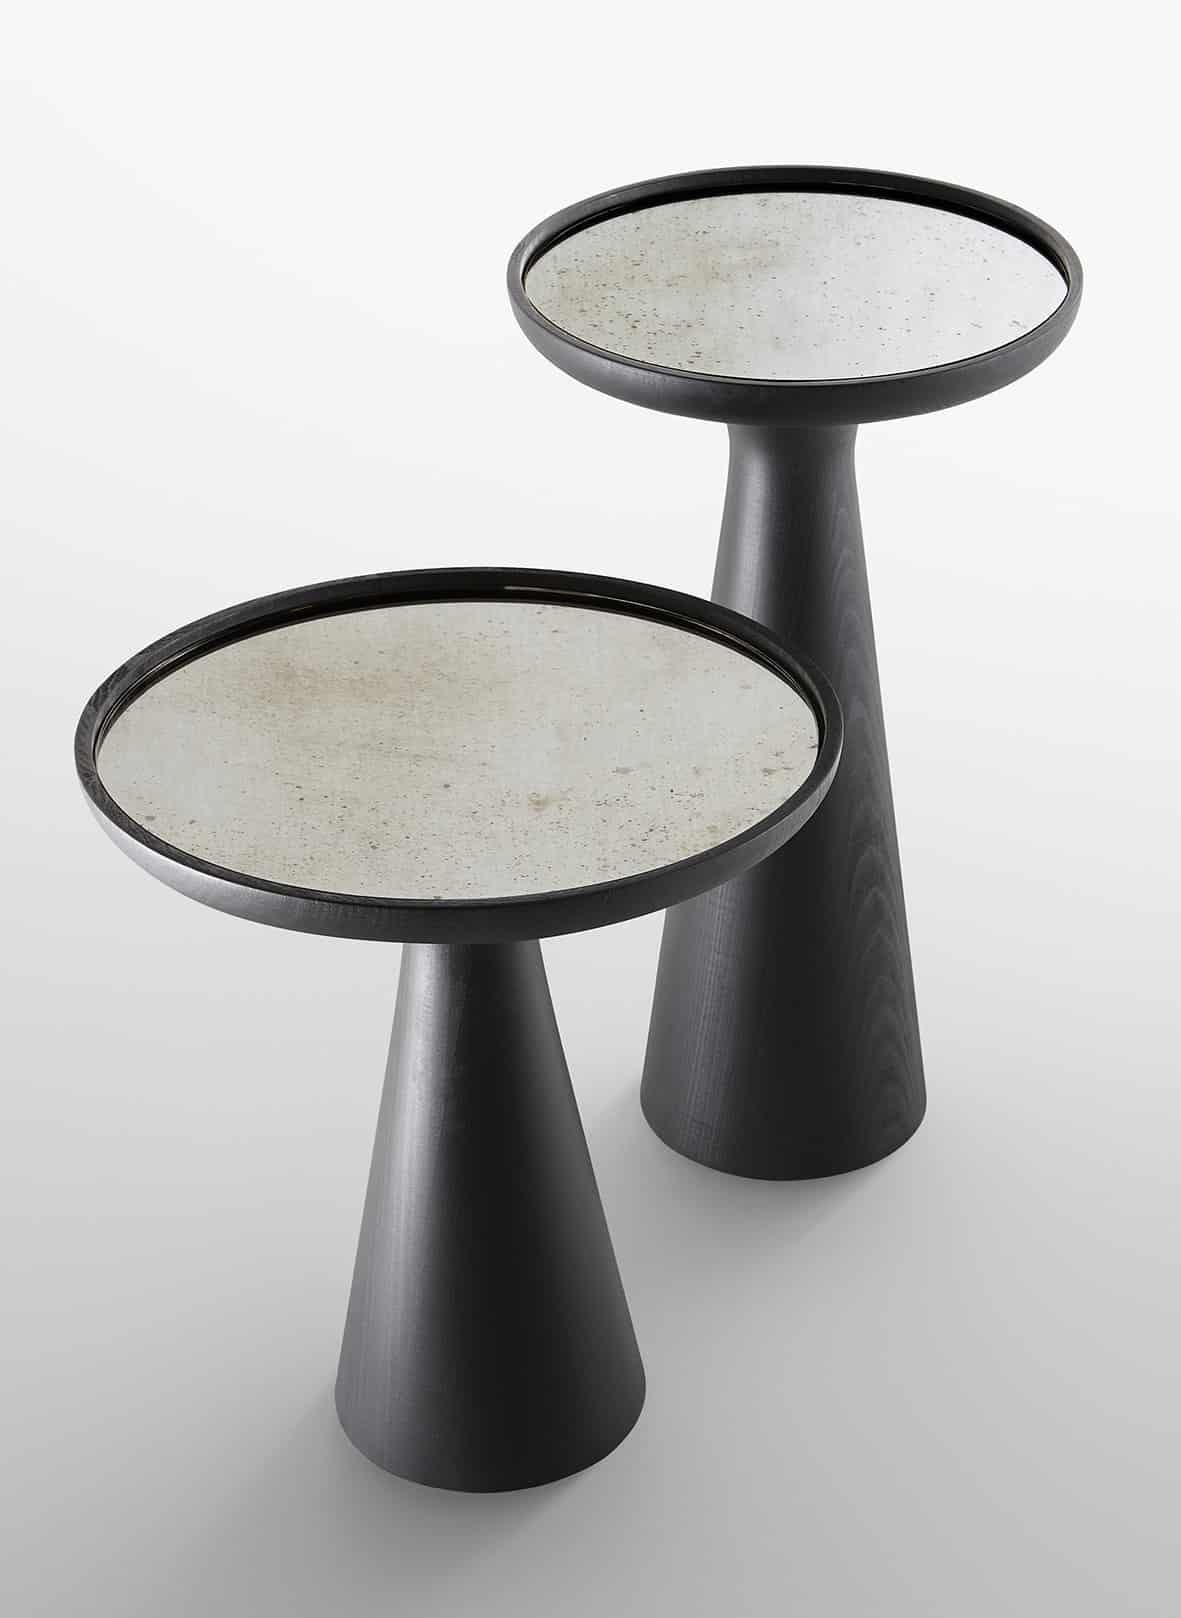 Fante GallottiRadice glass furniture milan 2015